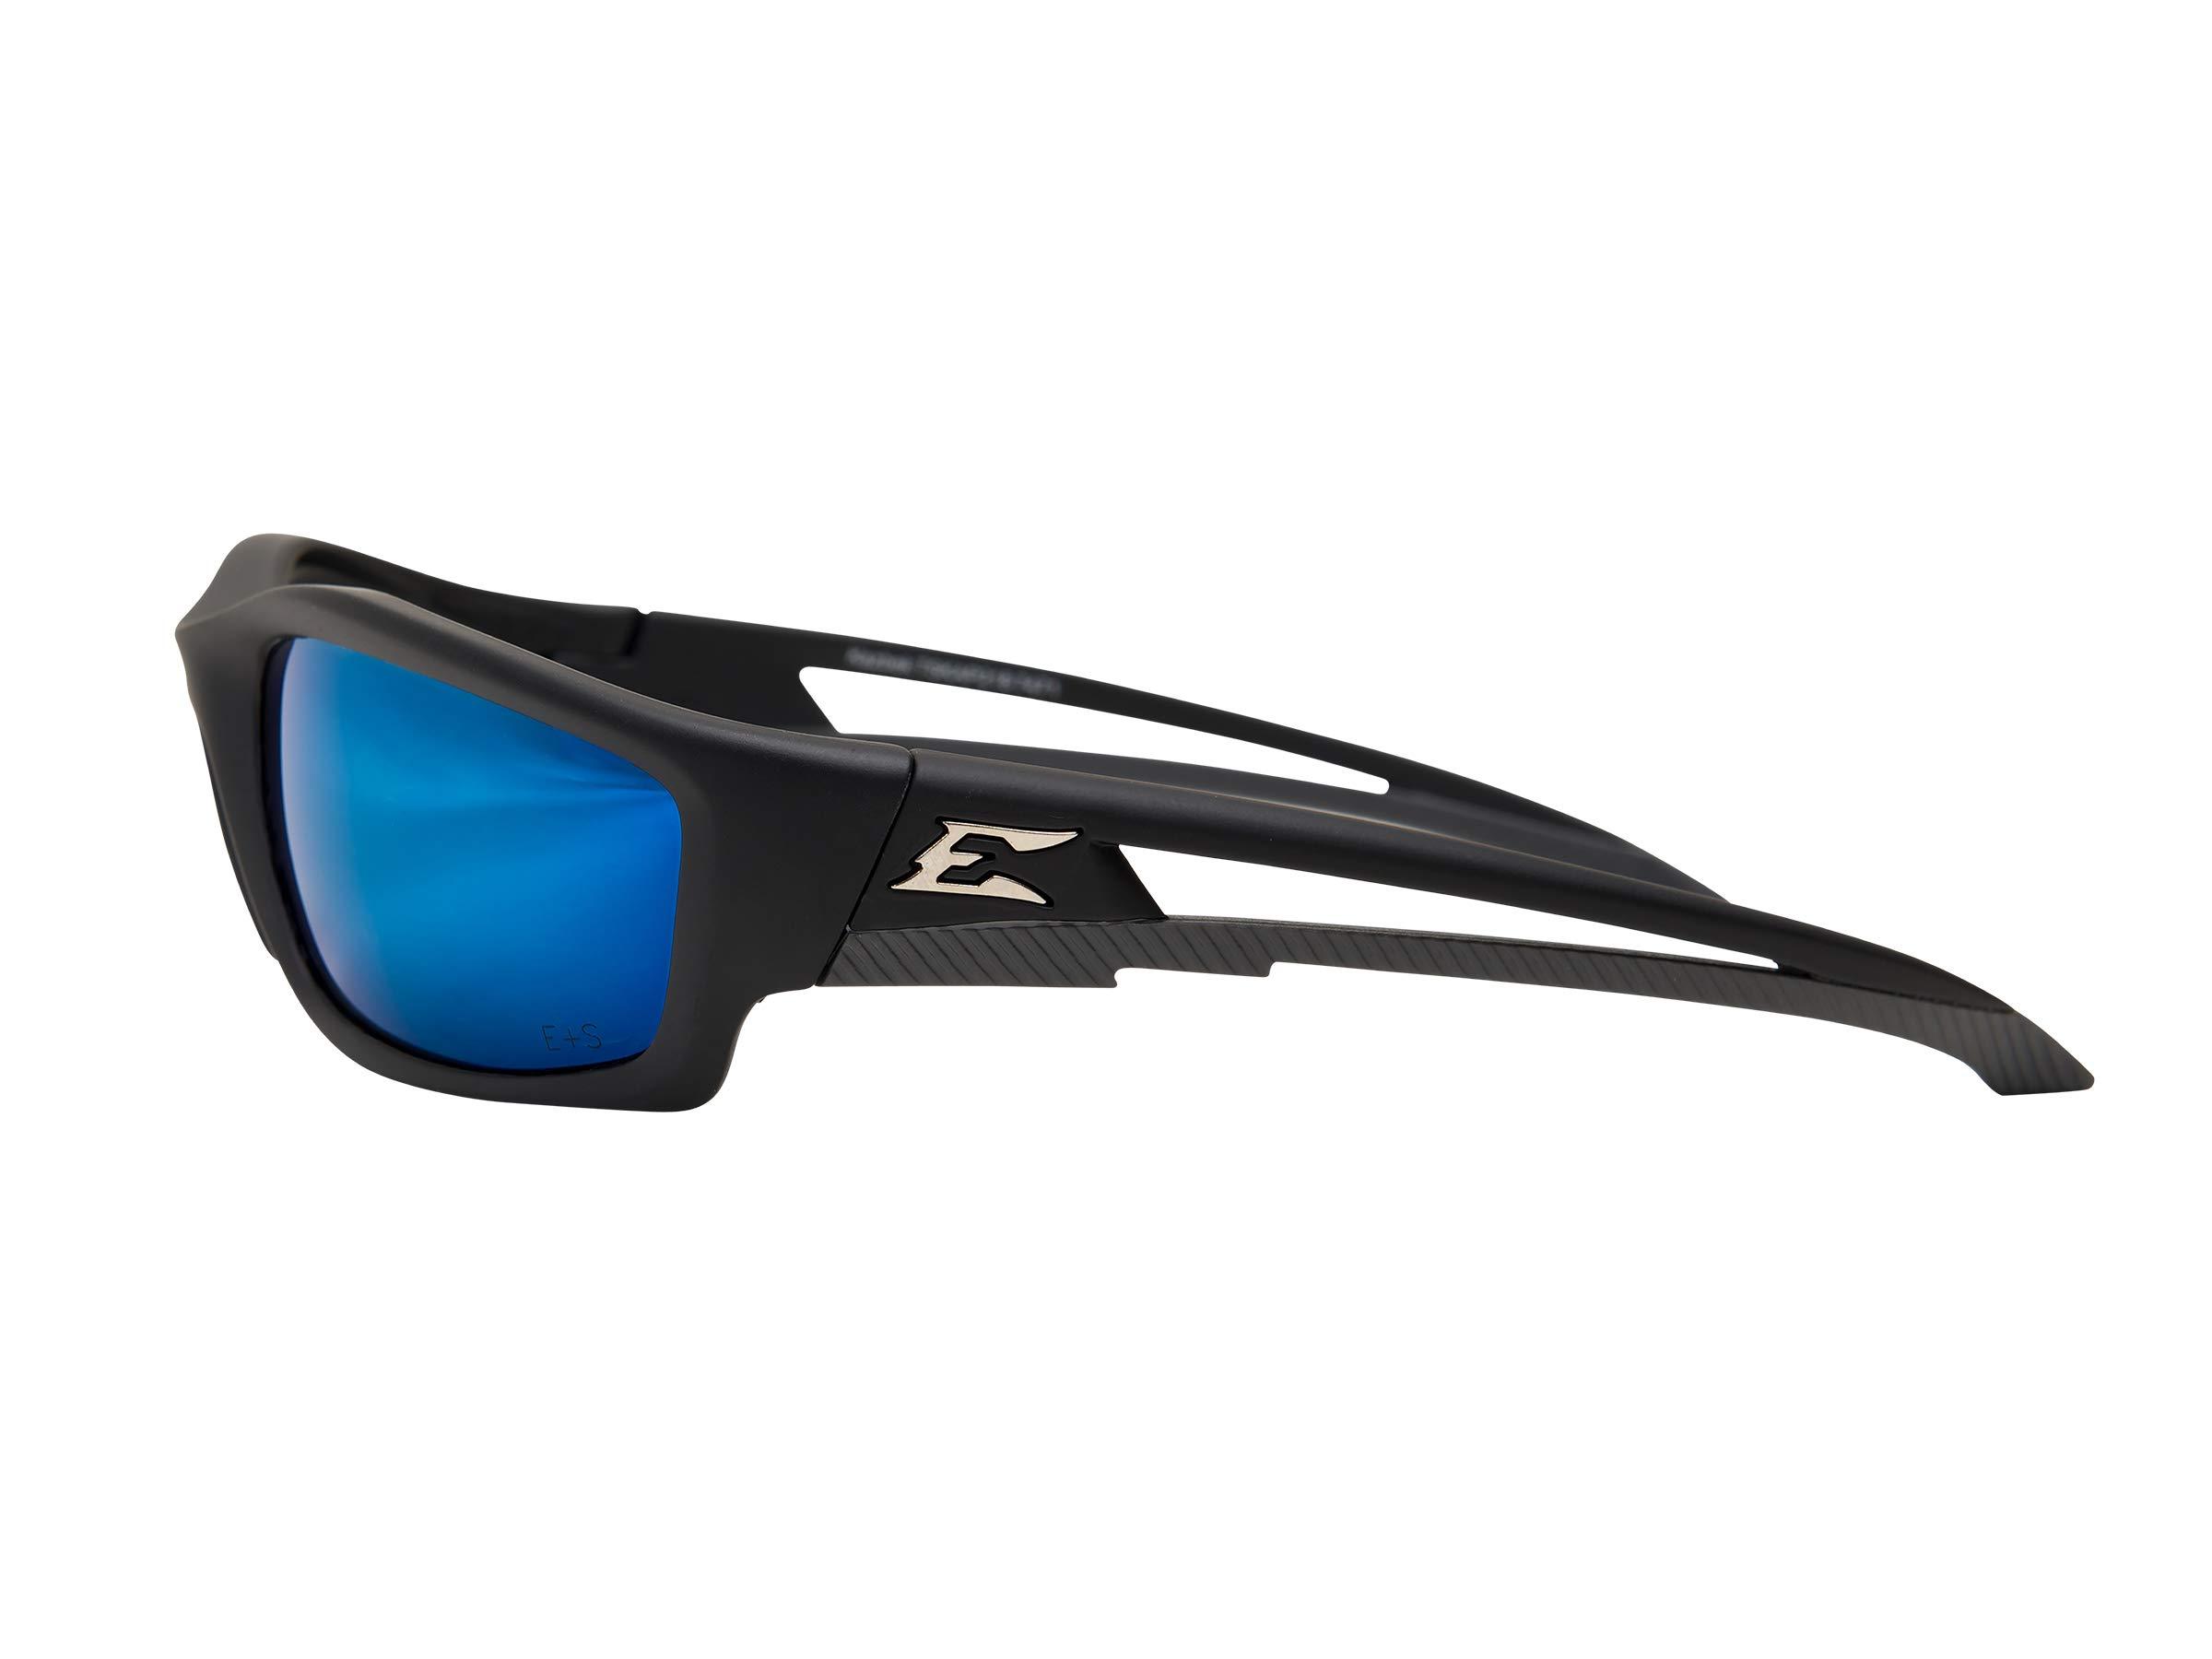 Edge Eyewear TSKAP218 Kazbek Polarized Safety Glasses, Black with Aqua Precision Blue Mirror Lens by Edge Eyewear